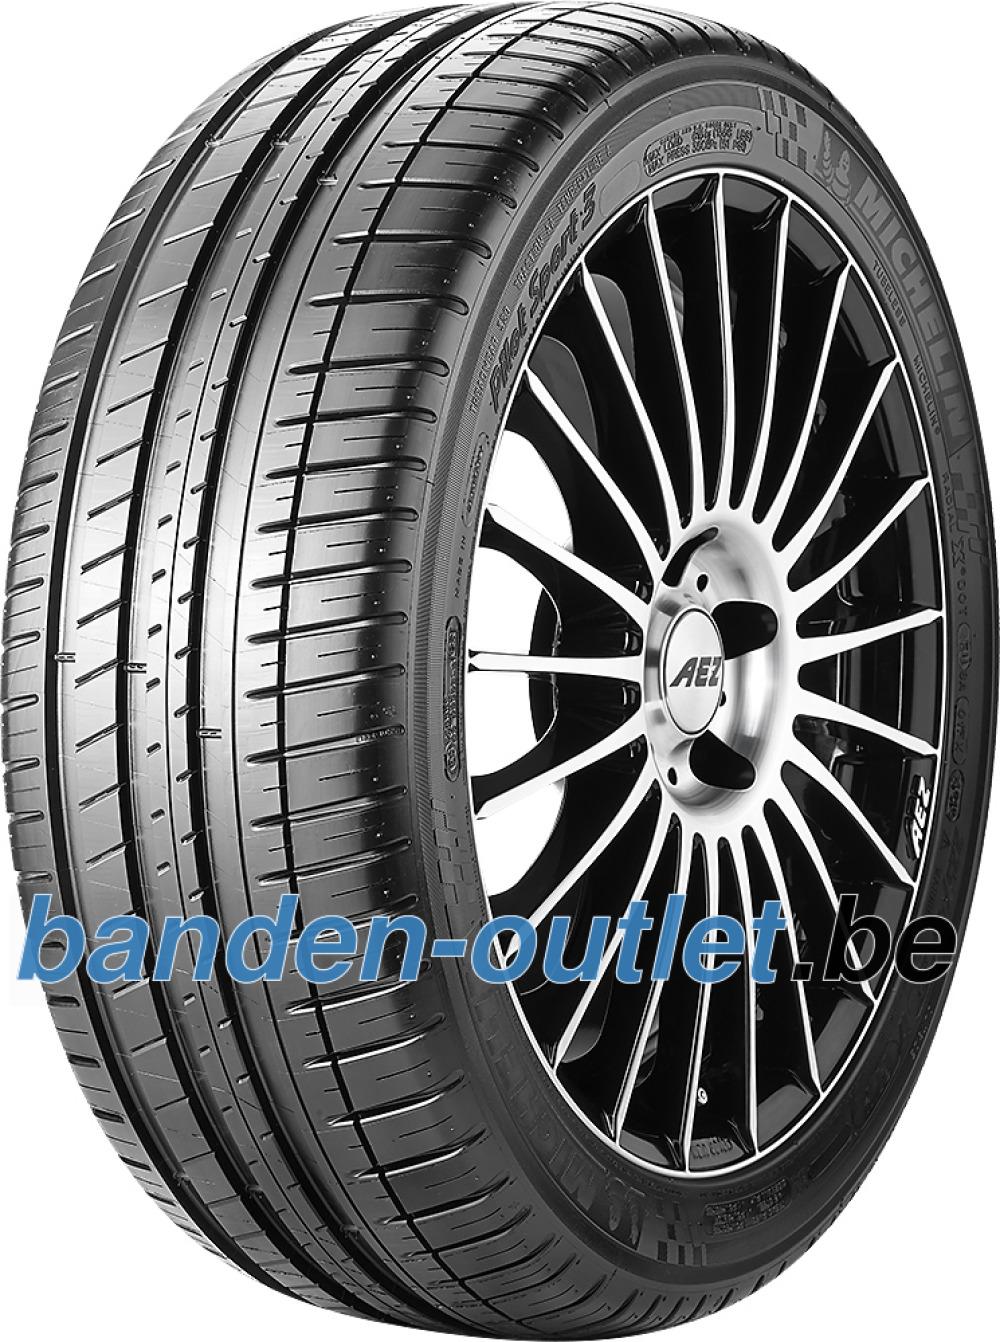 Michelin Pilot Sport 3 ( 255/35 ZR19 96Y XL GRNX, AO, met wangbescherming (FSL) )